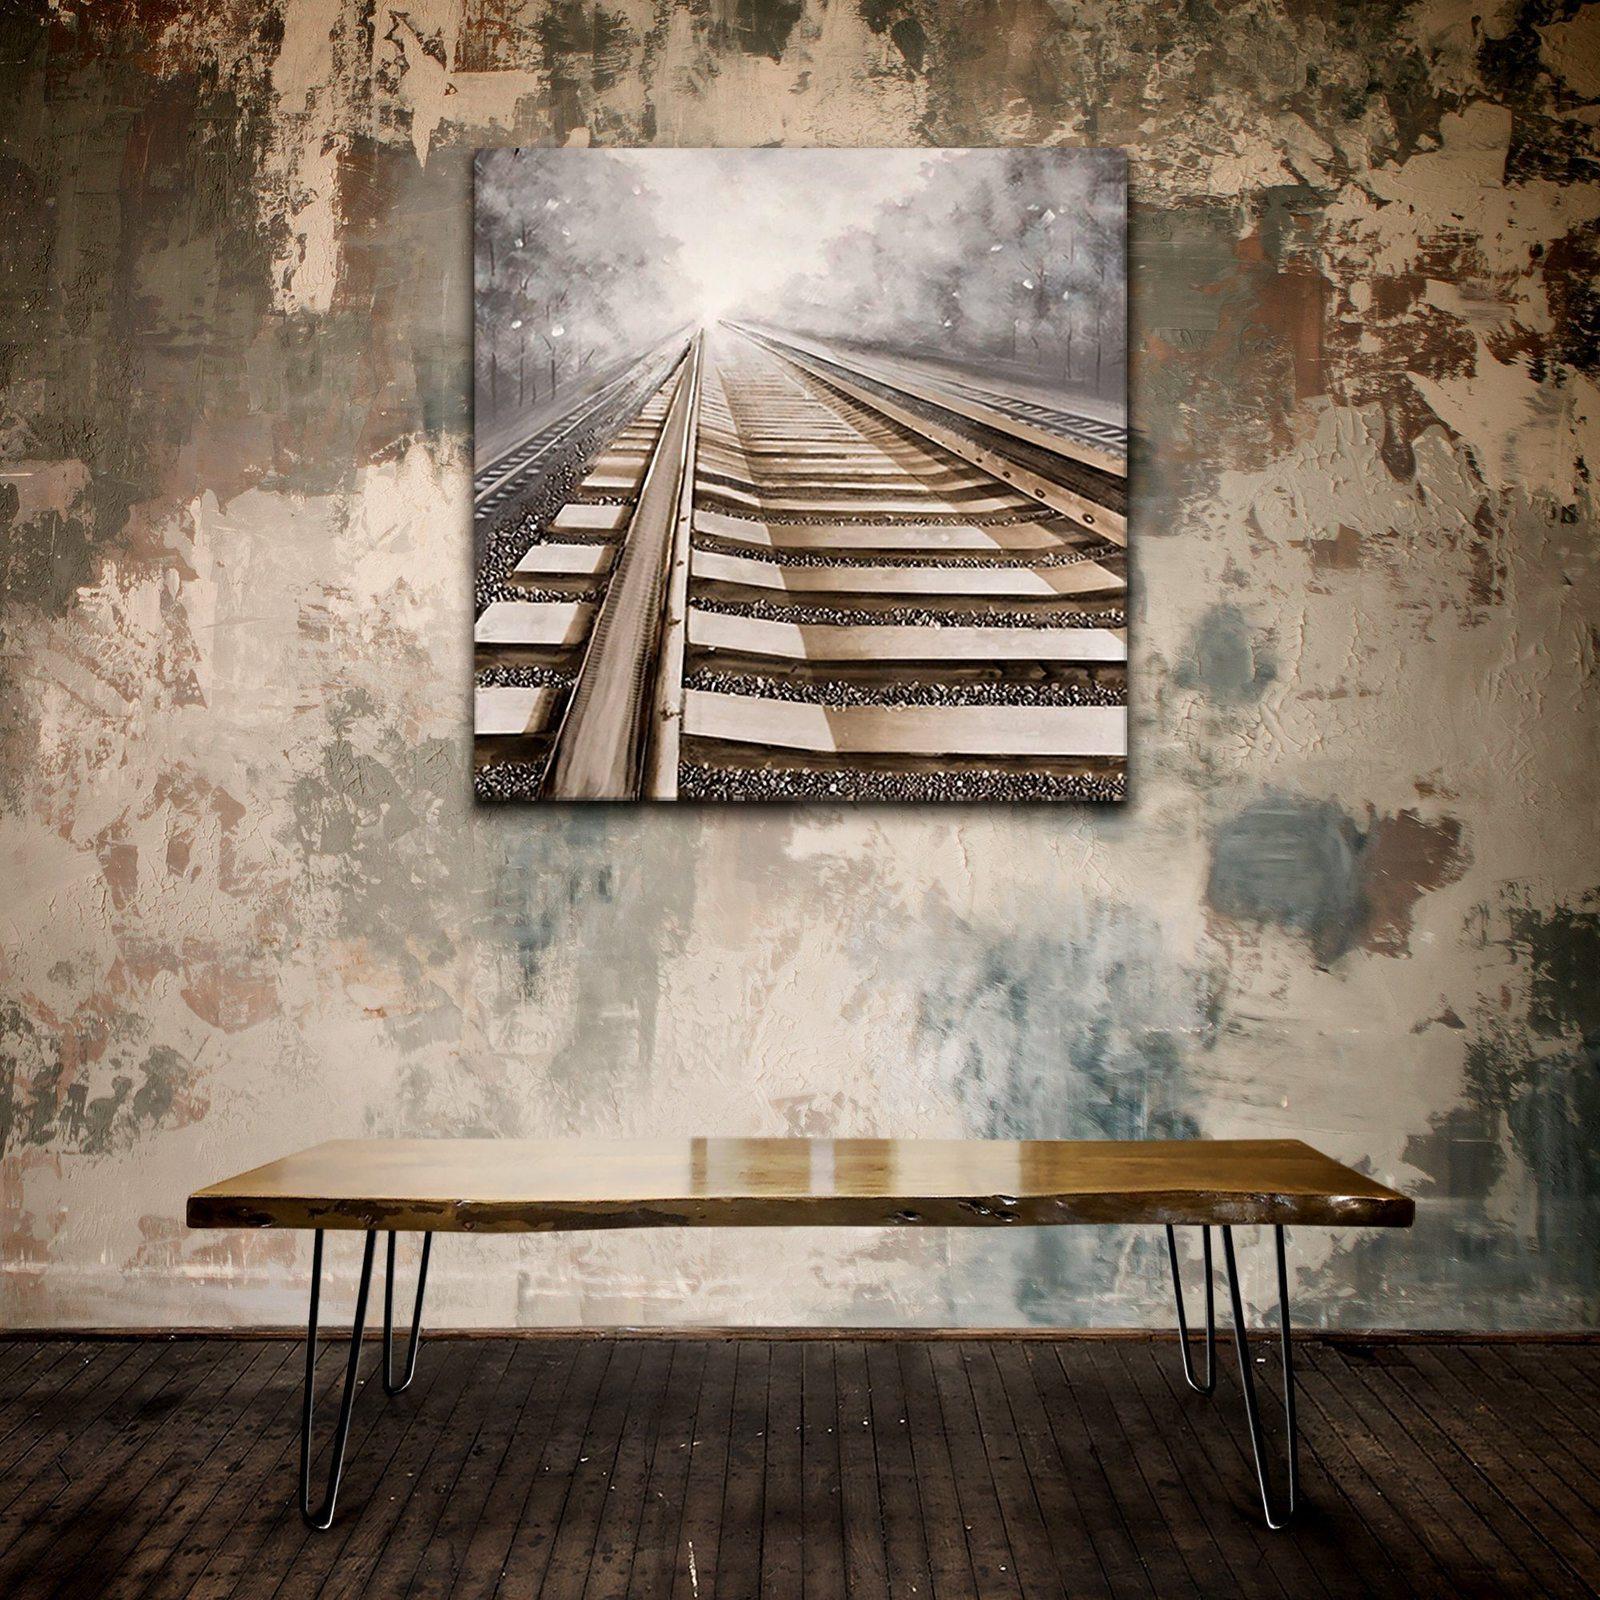 Solid Hardwood Acacia Live-Edge Slab for Bench - $375.00